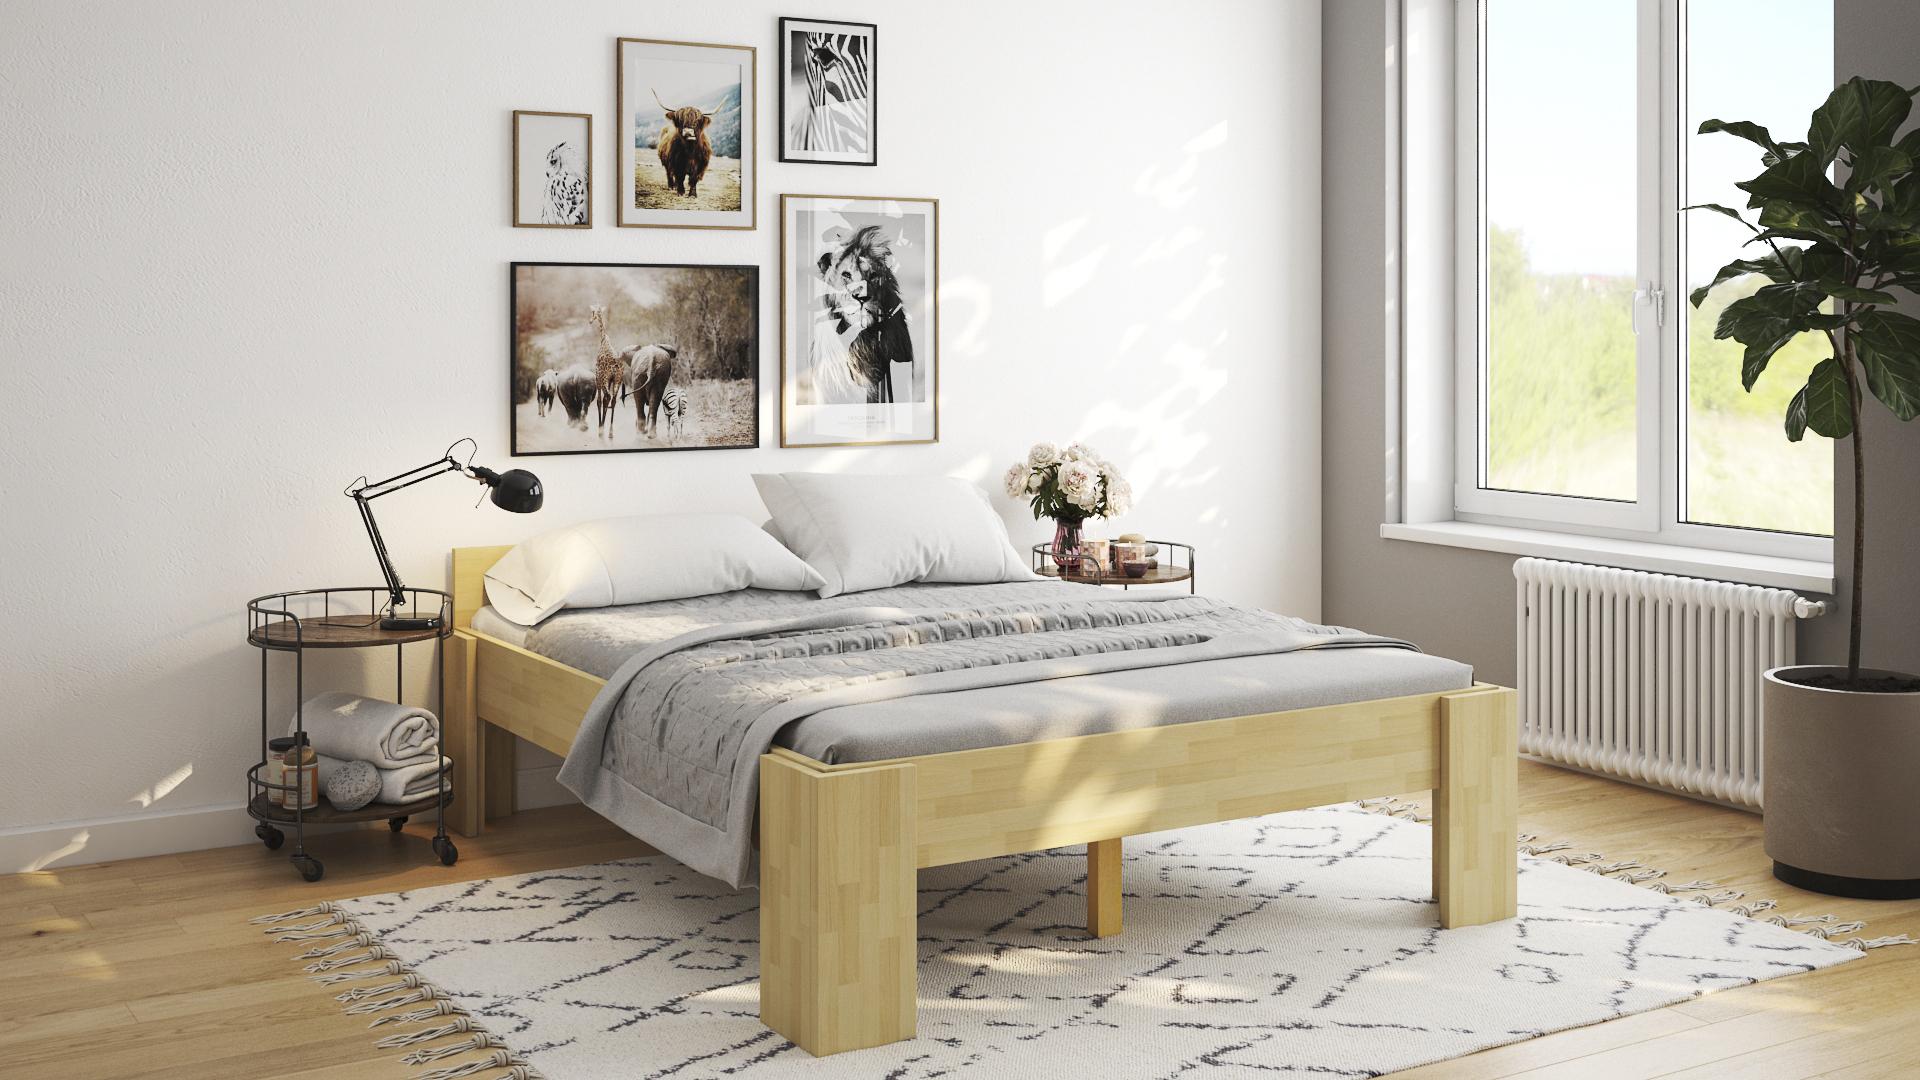 Full Size of Massiv Betten Massivholzbetten Onlineshop Hochwertige Massivbetten Aus Massivholz Holz Ebay 180x200 Outlet Amazon Dico Massivholzküche Bett Ausgefallene Bett Massiv Betten